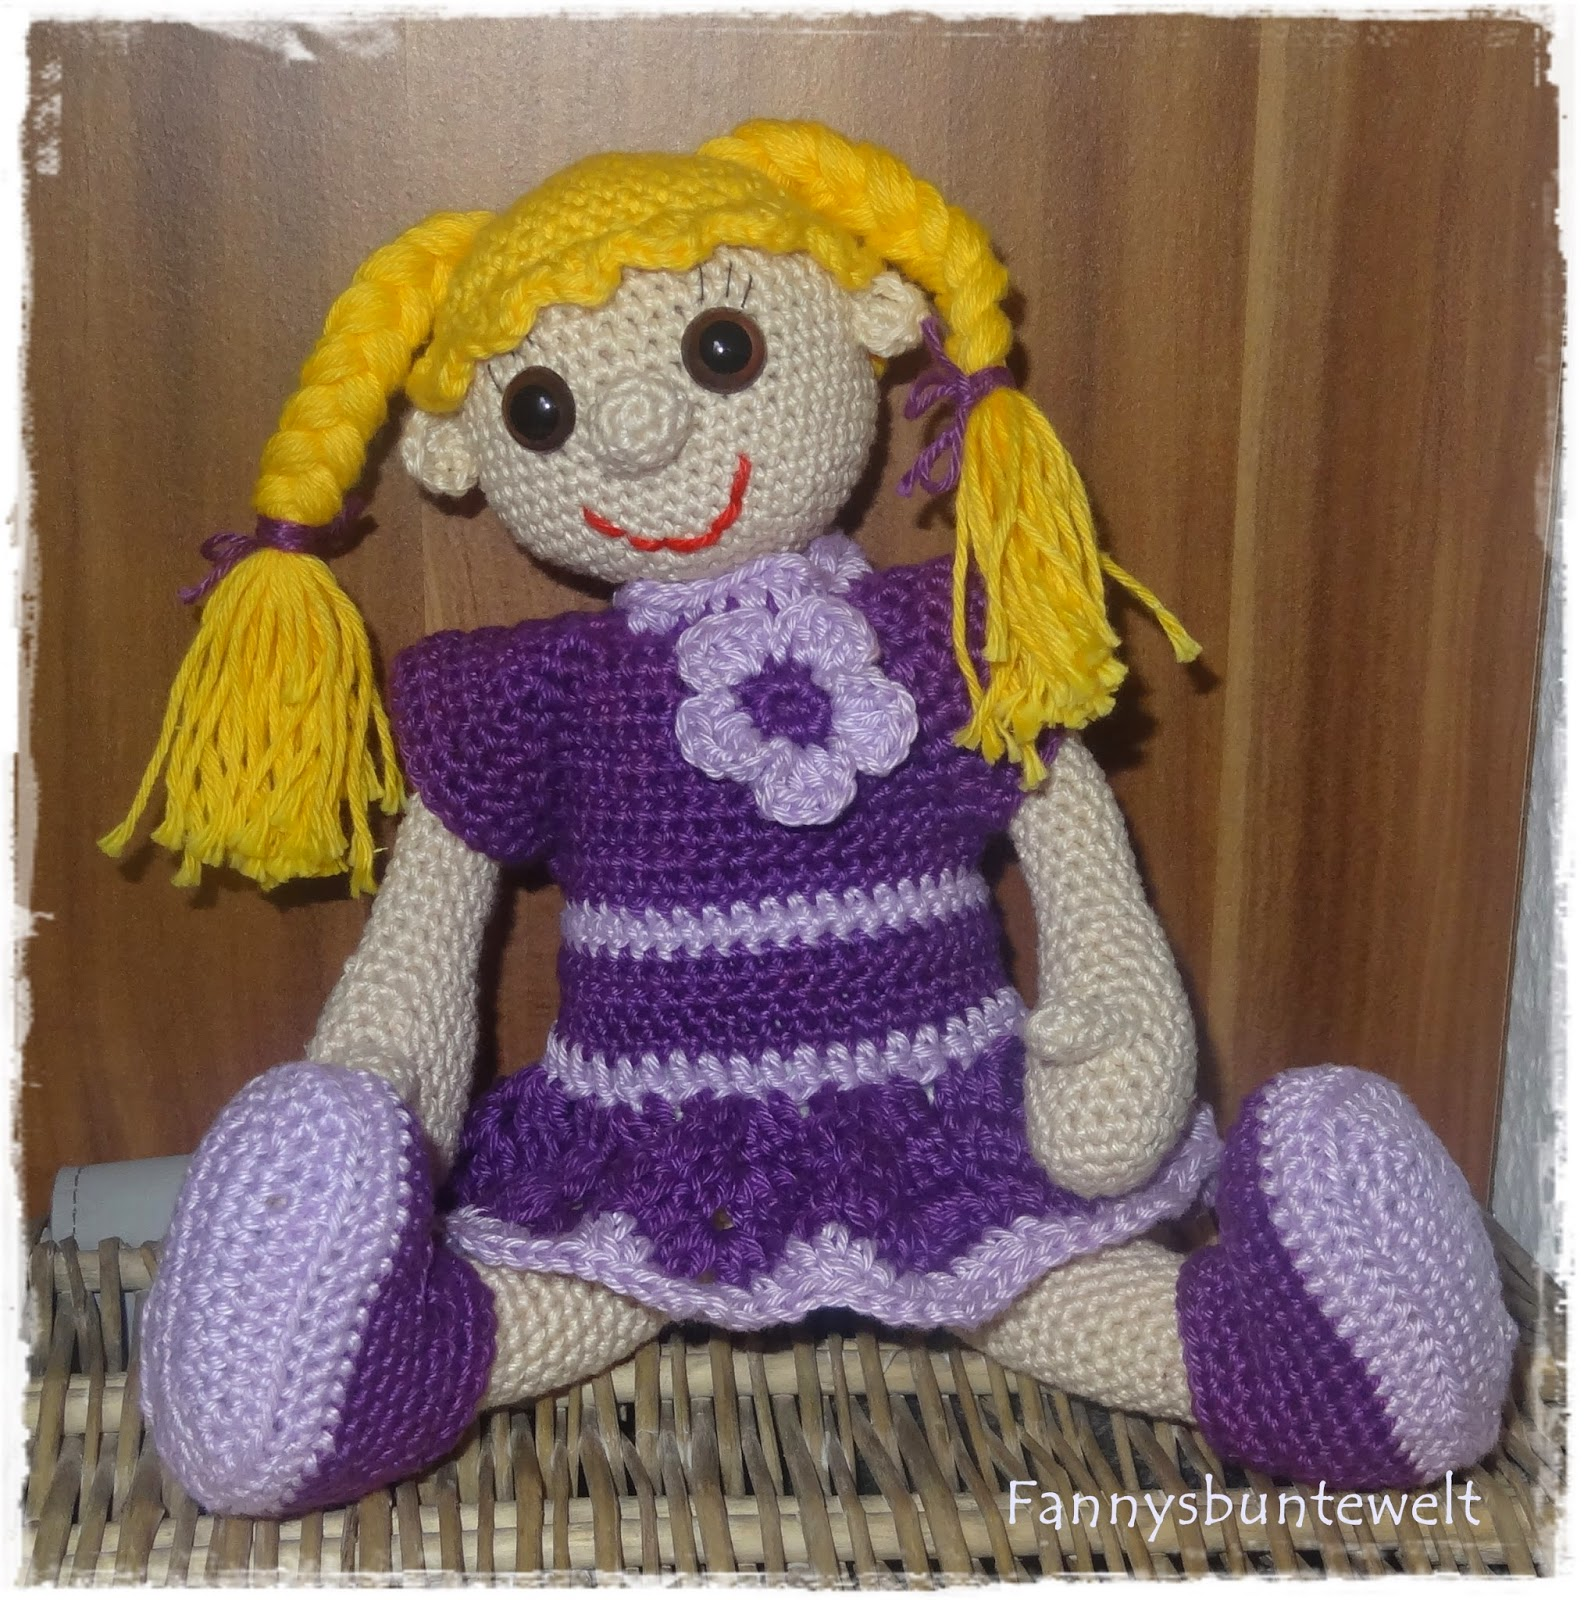 Fannysbuntewelt: Häkelanleitung Puppe Lotte